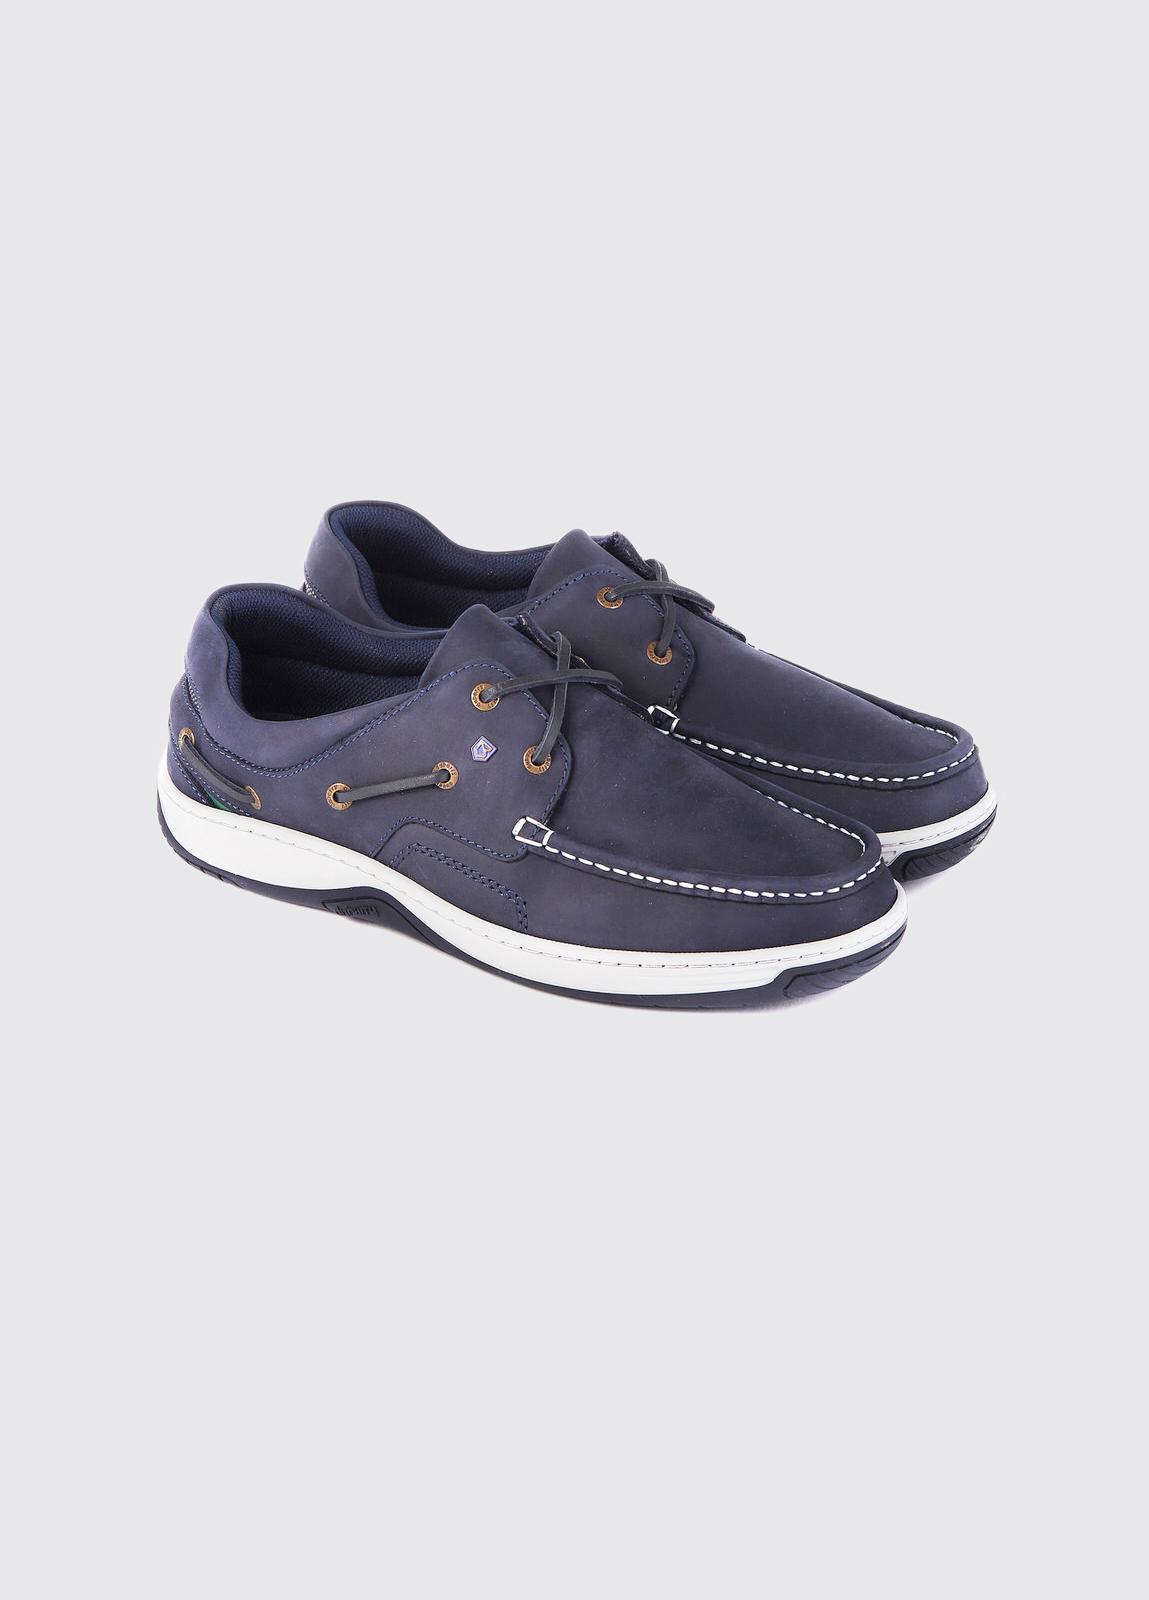 Navigator Deck Shoe - Navy